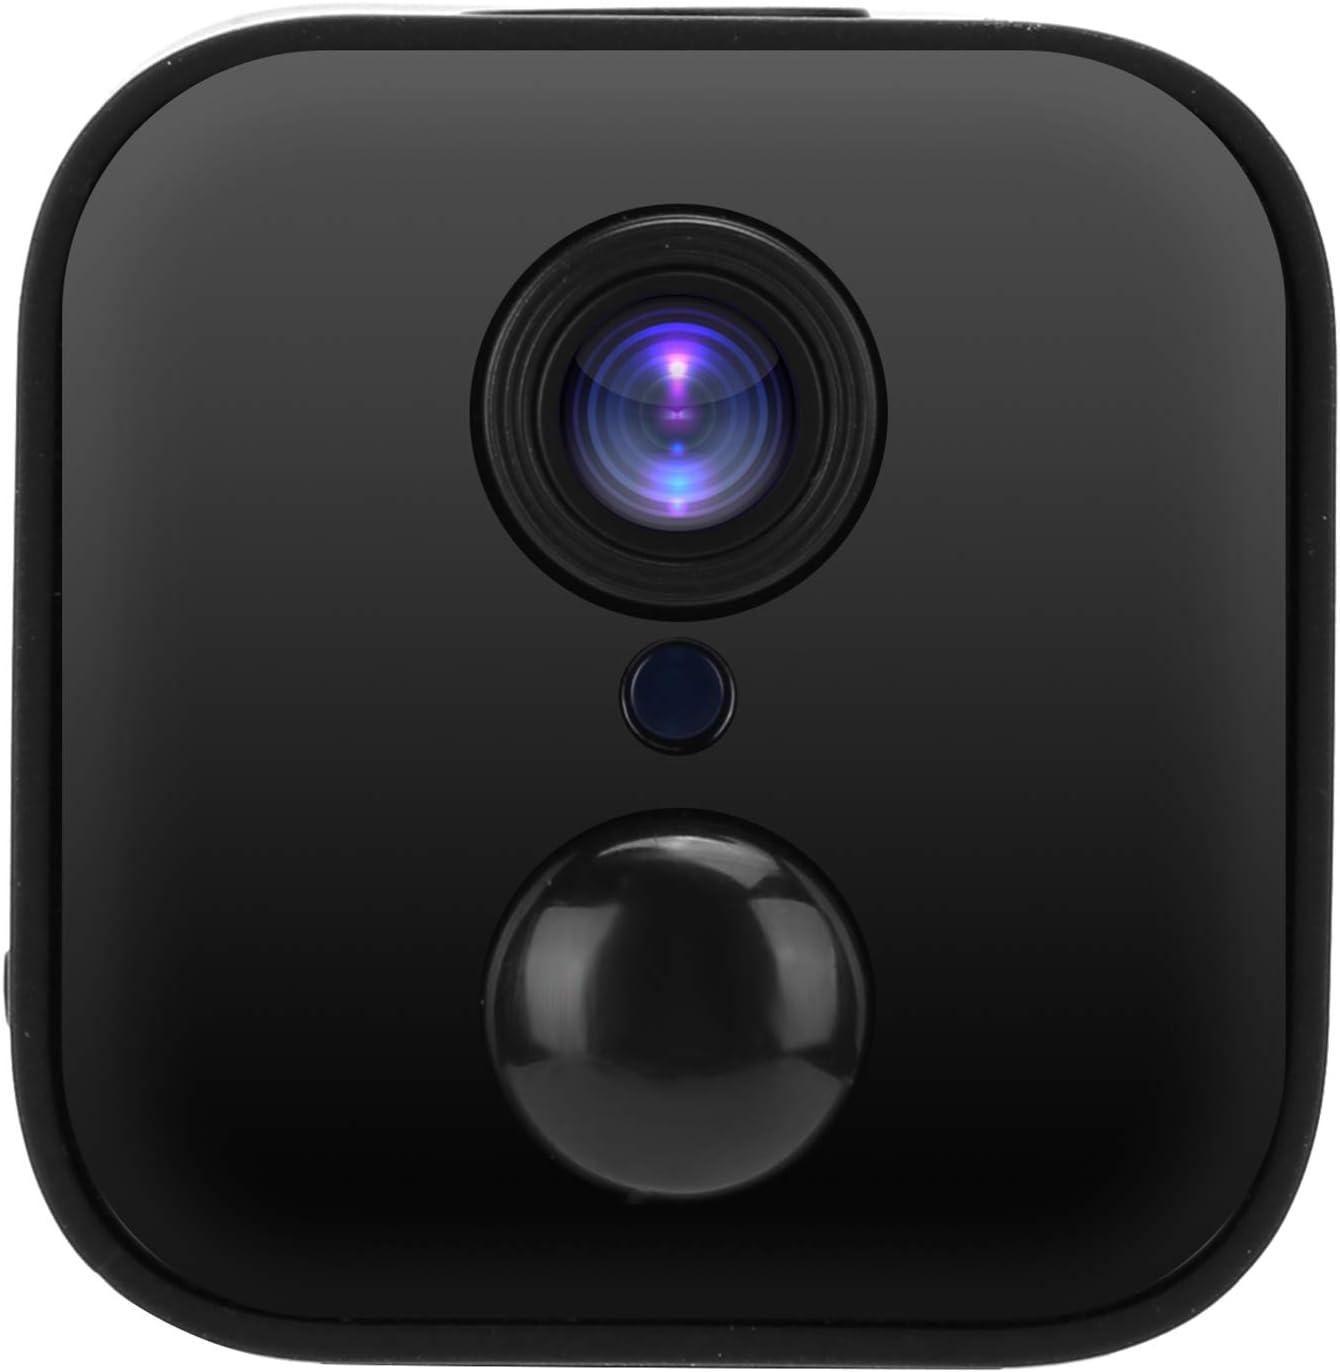 Tampa Mall Mxzzand Portable WiFi Night Viewing Baby Fashionable Monitor Motion Detectio